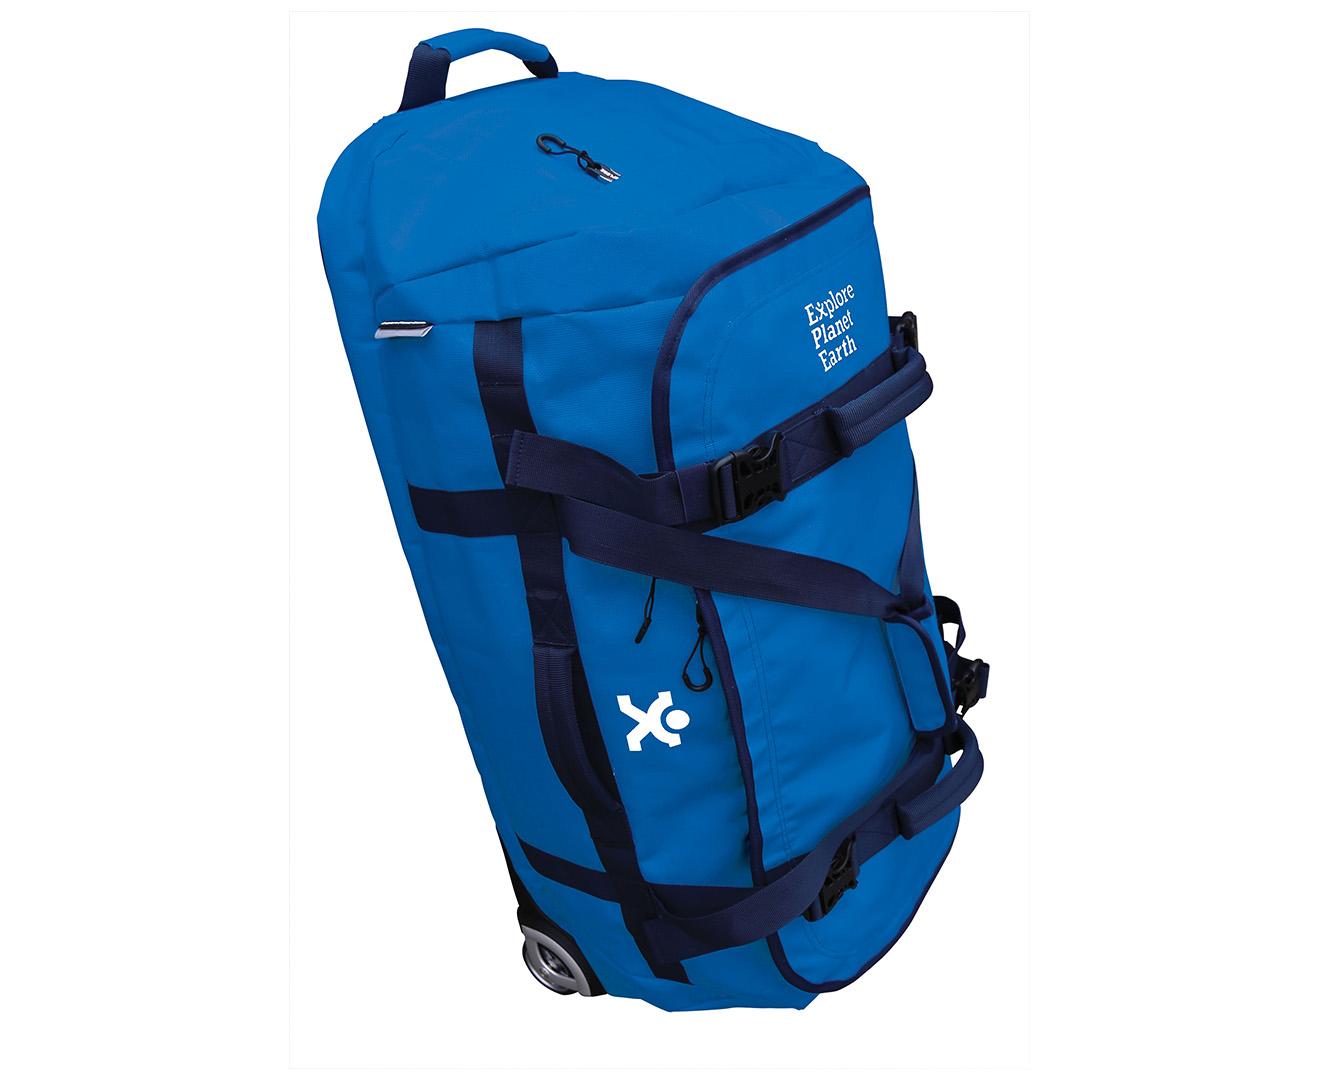 fbdb489309 Explore Planet Earth 90L Pisces Roller Duffle Bag - Navy Blue ...